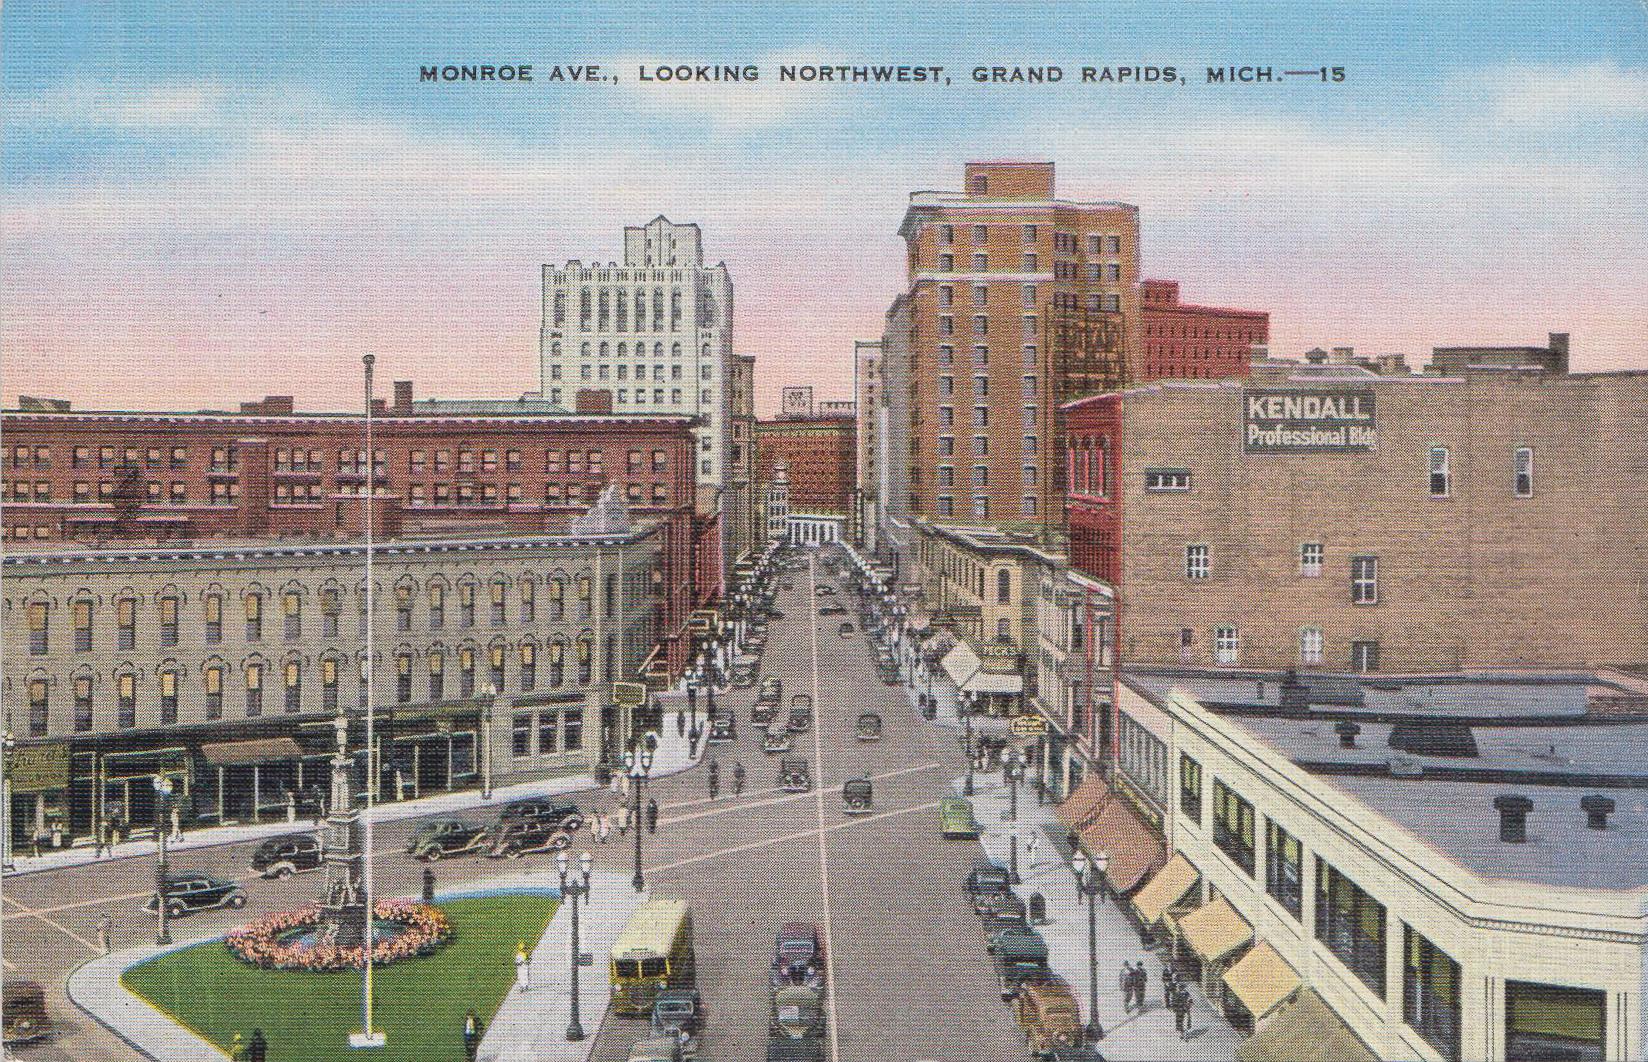 Monroe Ave. Looking Northwest, Grand Rapids, MI - circa 1940